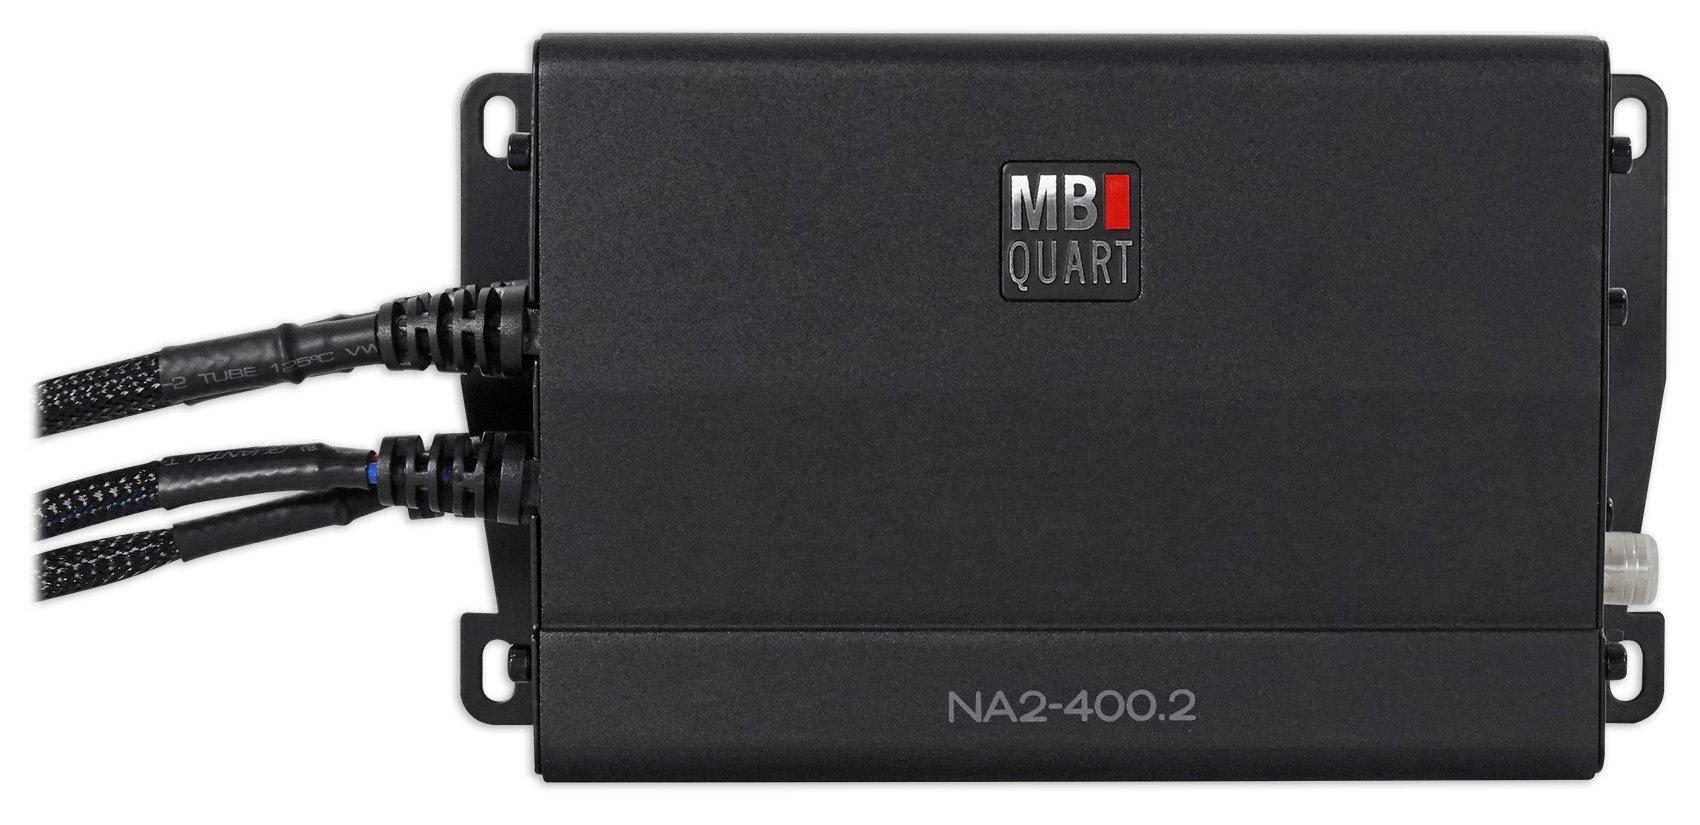 MB QUART NA2-400.2 400w 2-Channel Amplifier Amp For Polaris/ATV/UTV/RZR/CART by MB Quart (Image #1)